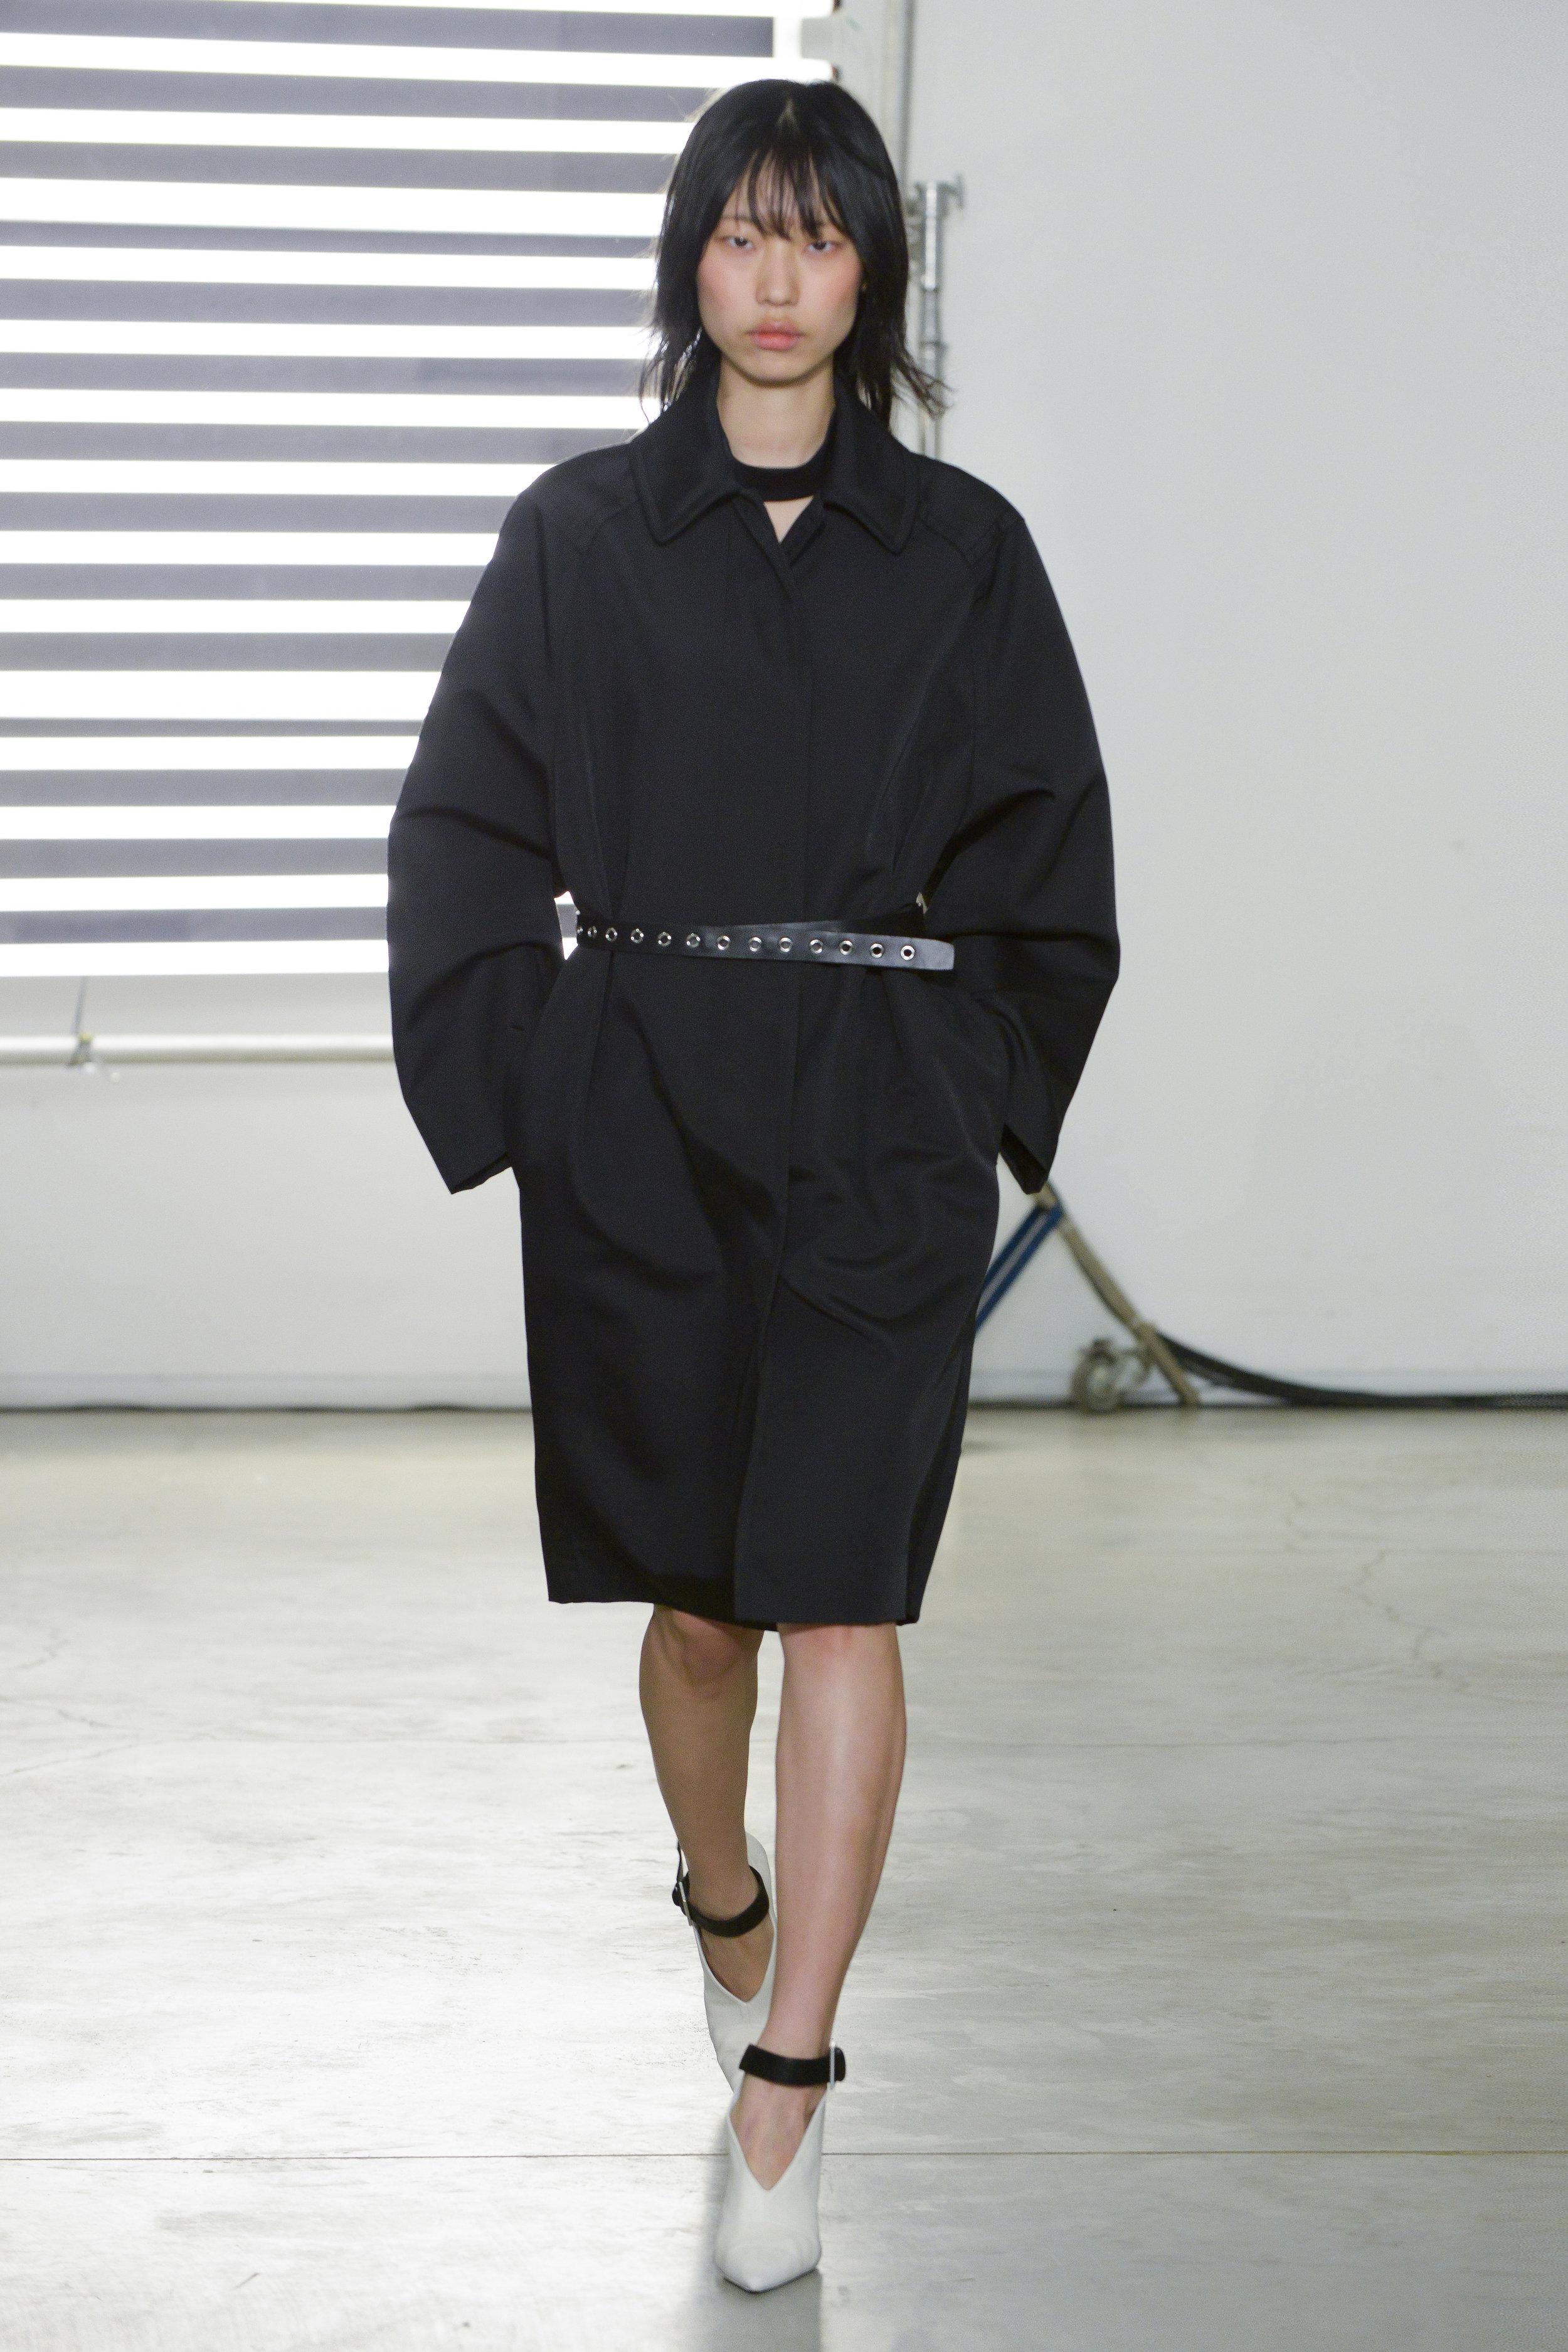 Look 9 Black wool/nylon canvas coat with black leather belt.